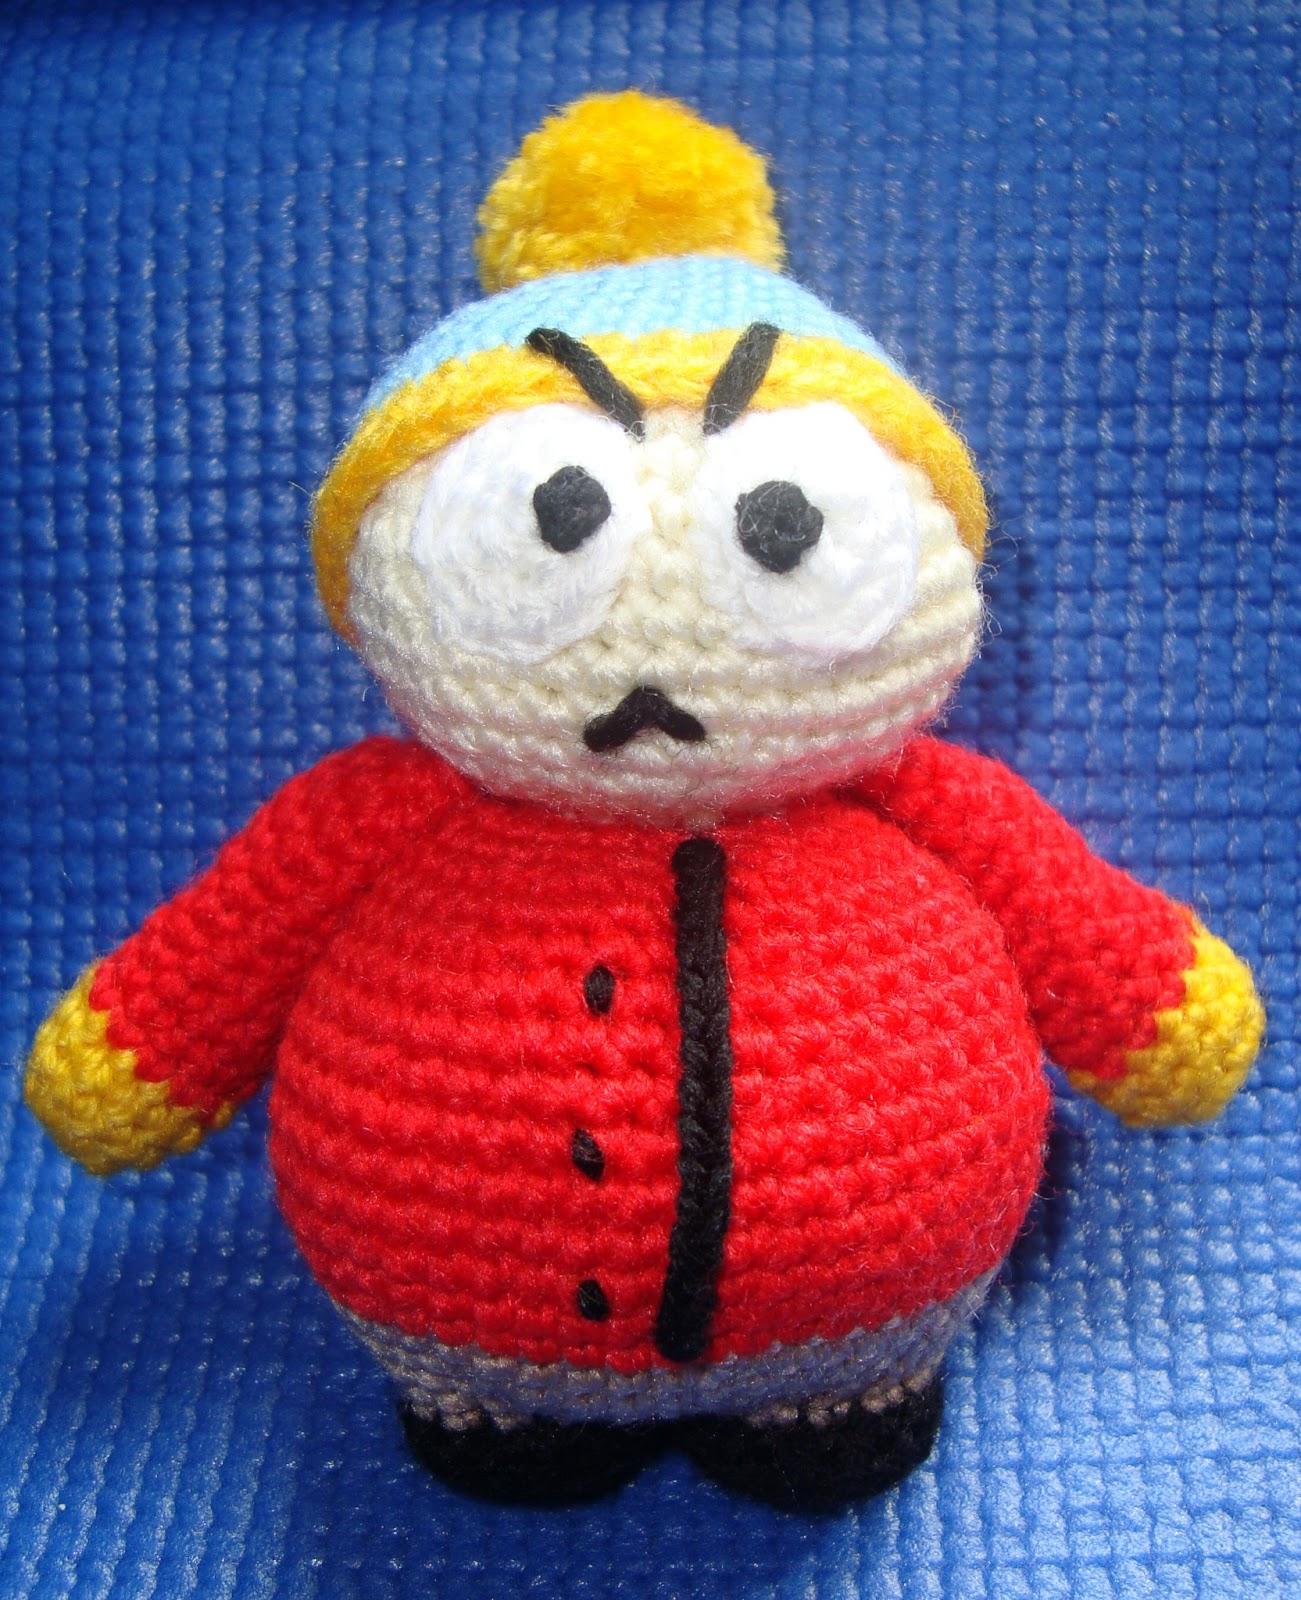 Amigurumi Cartman : Semillas de bonsai: Amigurumi Cartman (South Park)